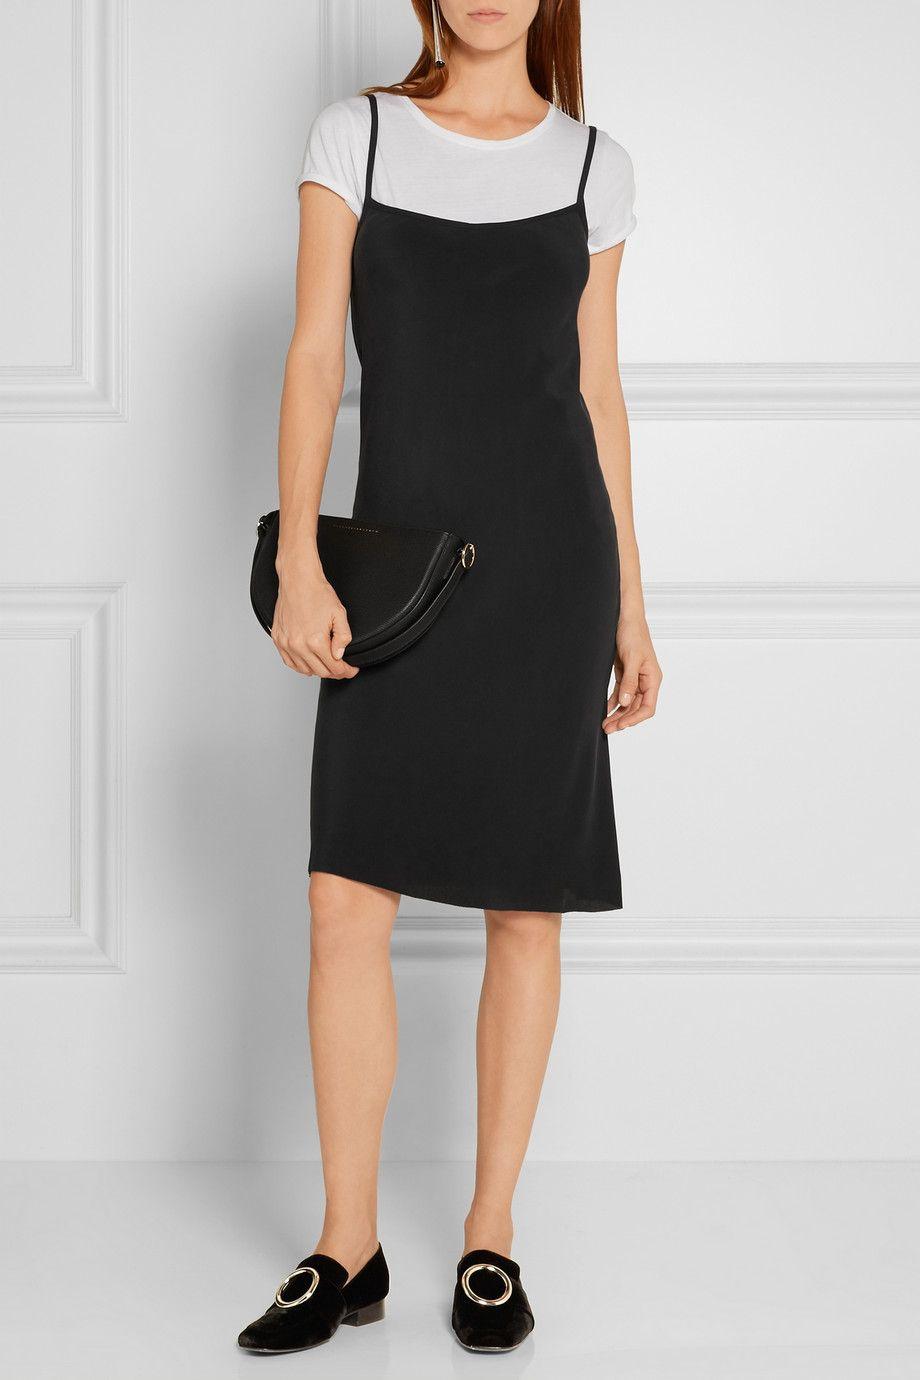 5750c493158c JOSEPH Washed-silk dress$570 | Style <3 LOOKBOOK <3 | Silk Dress ...